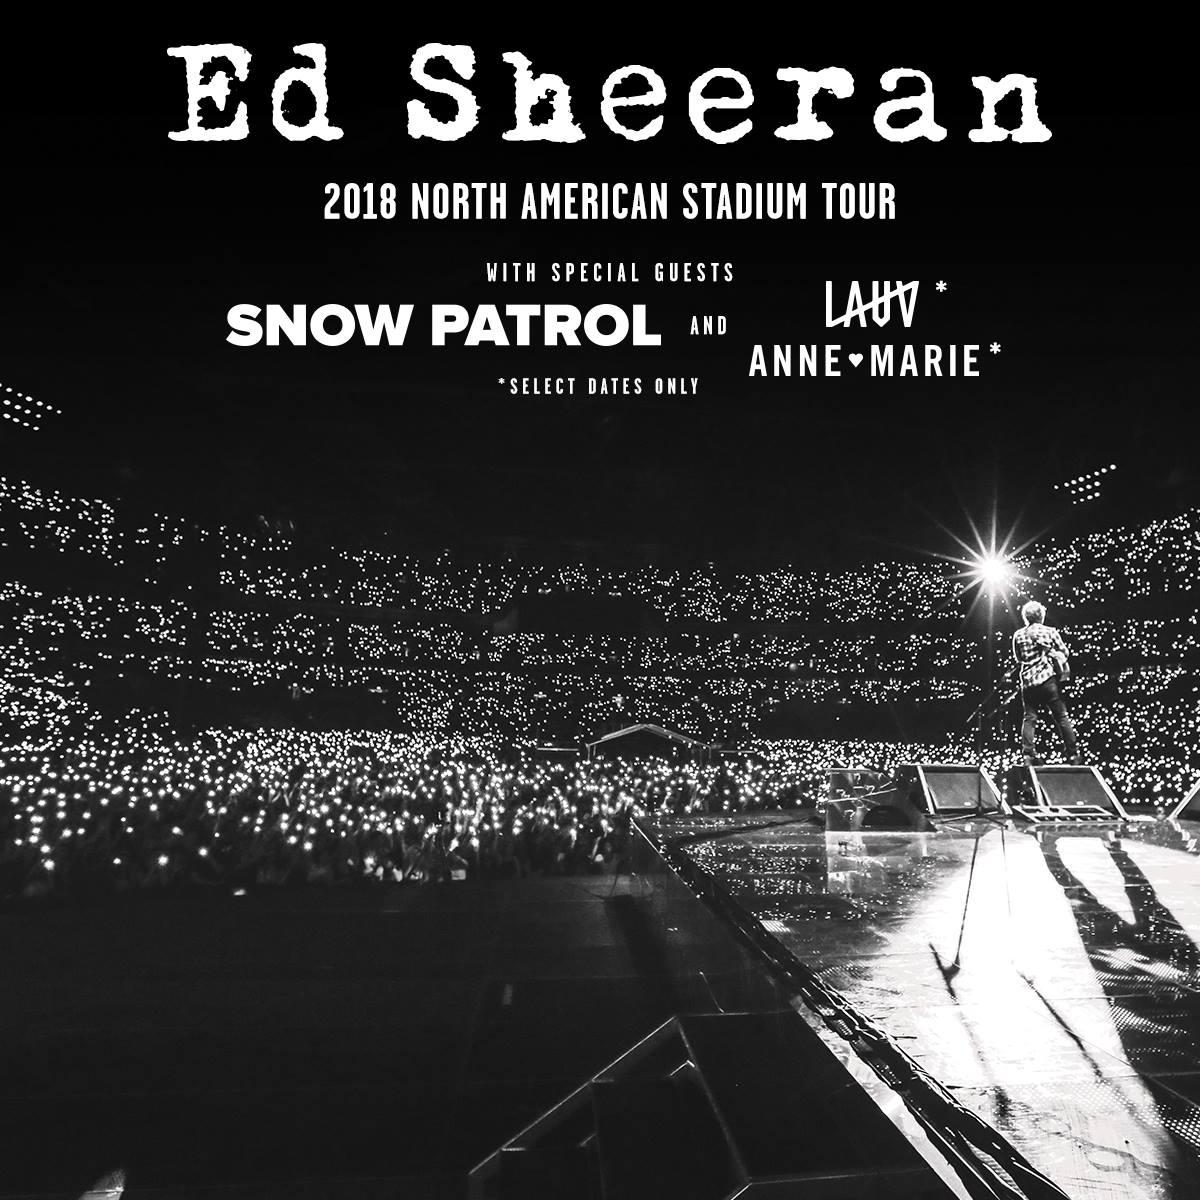 Snow-Patrol-Ed-Sheeran.jpg